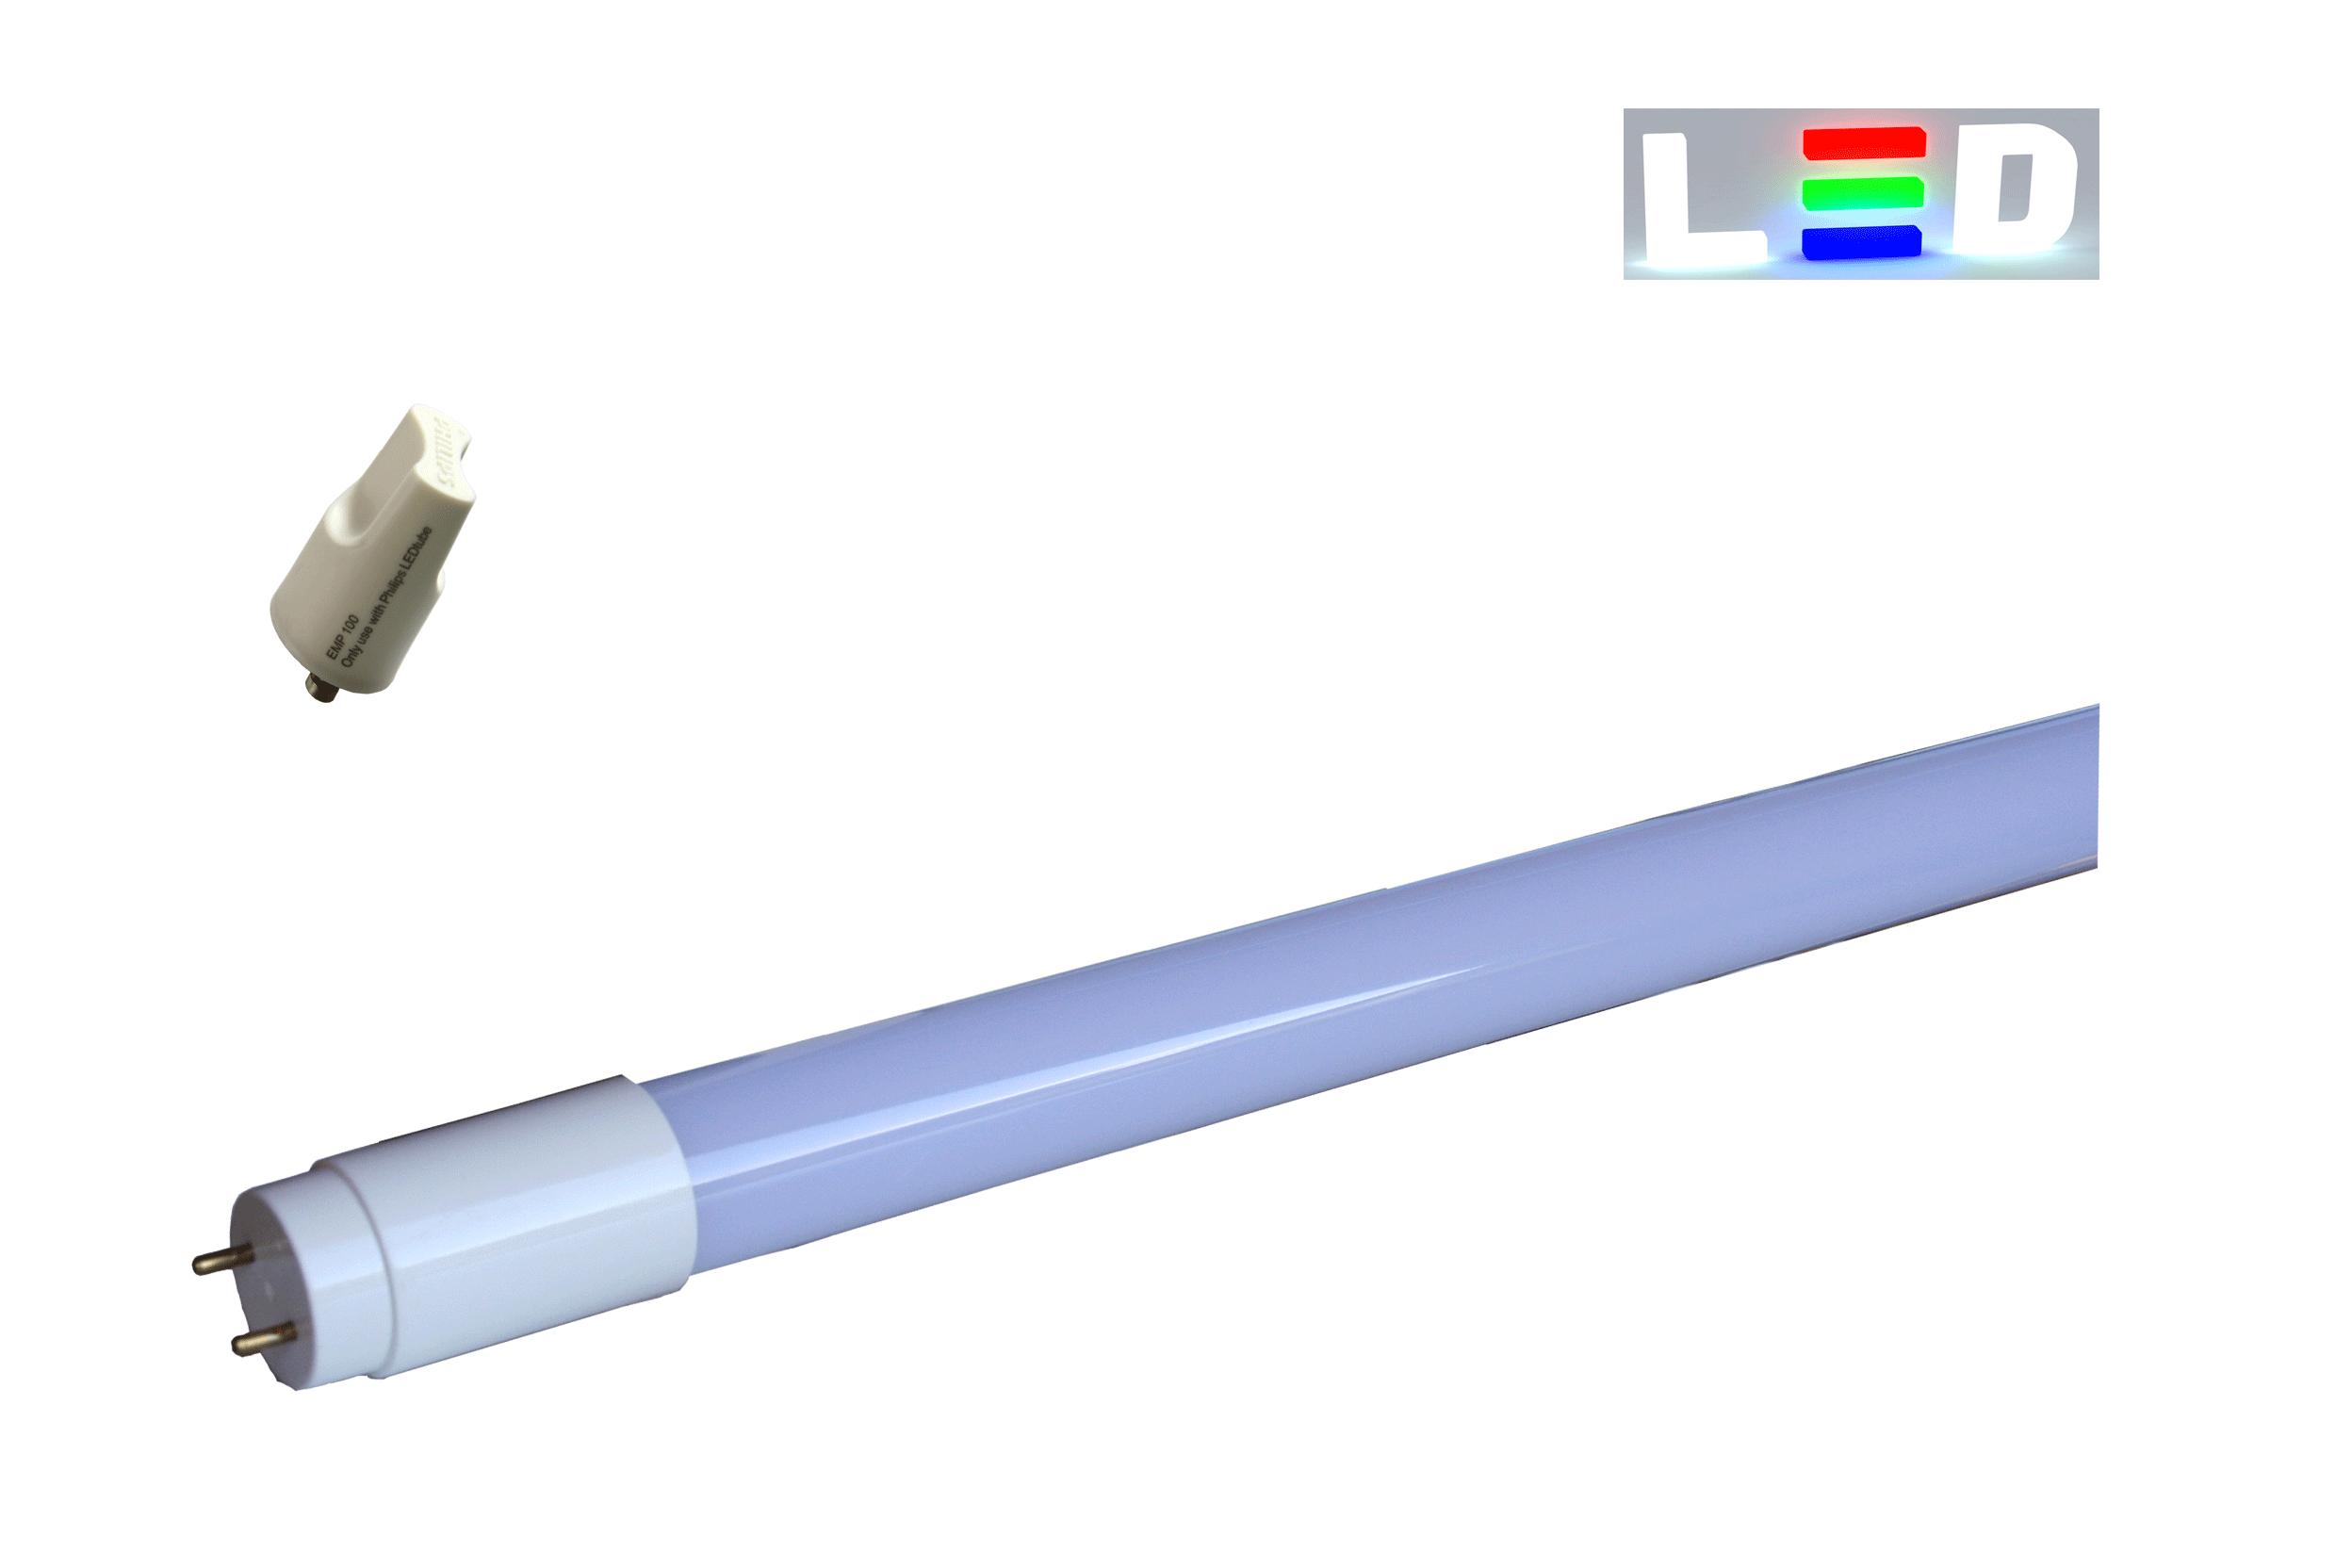 LED Leuchtstoffröhre 1200mm • 18W • 1600lm • 3000K • matt